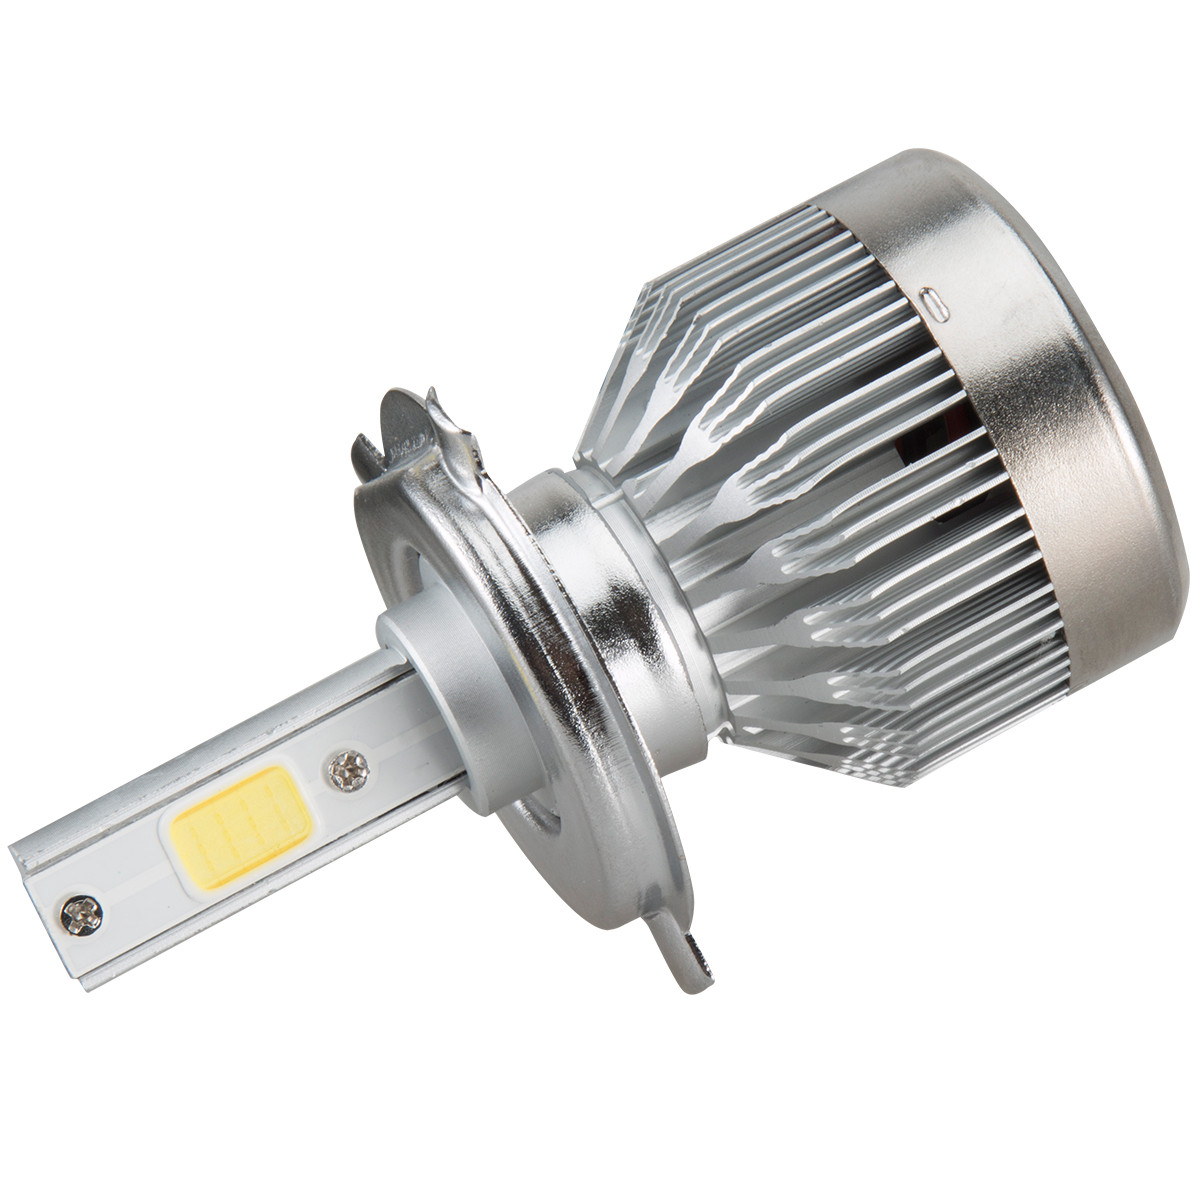 Car Headlights 2x H4 LED Light Headlight Vehicle Car Hi/Lo Beam Bulb Kit 6000k 60W 6000LM White Car Styling @016